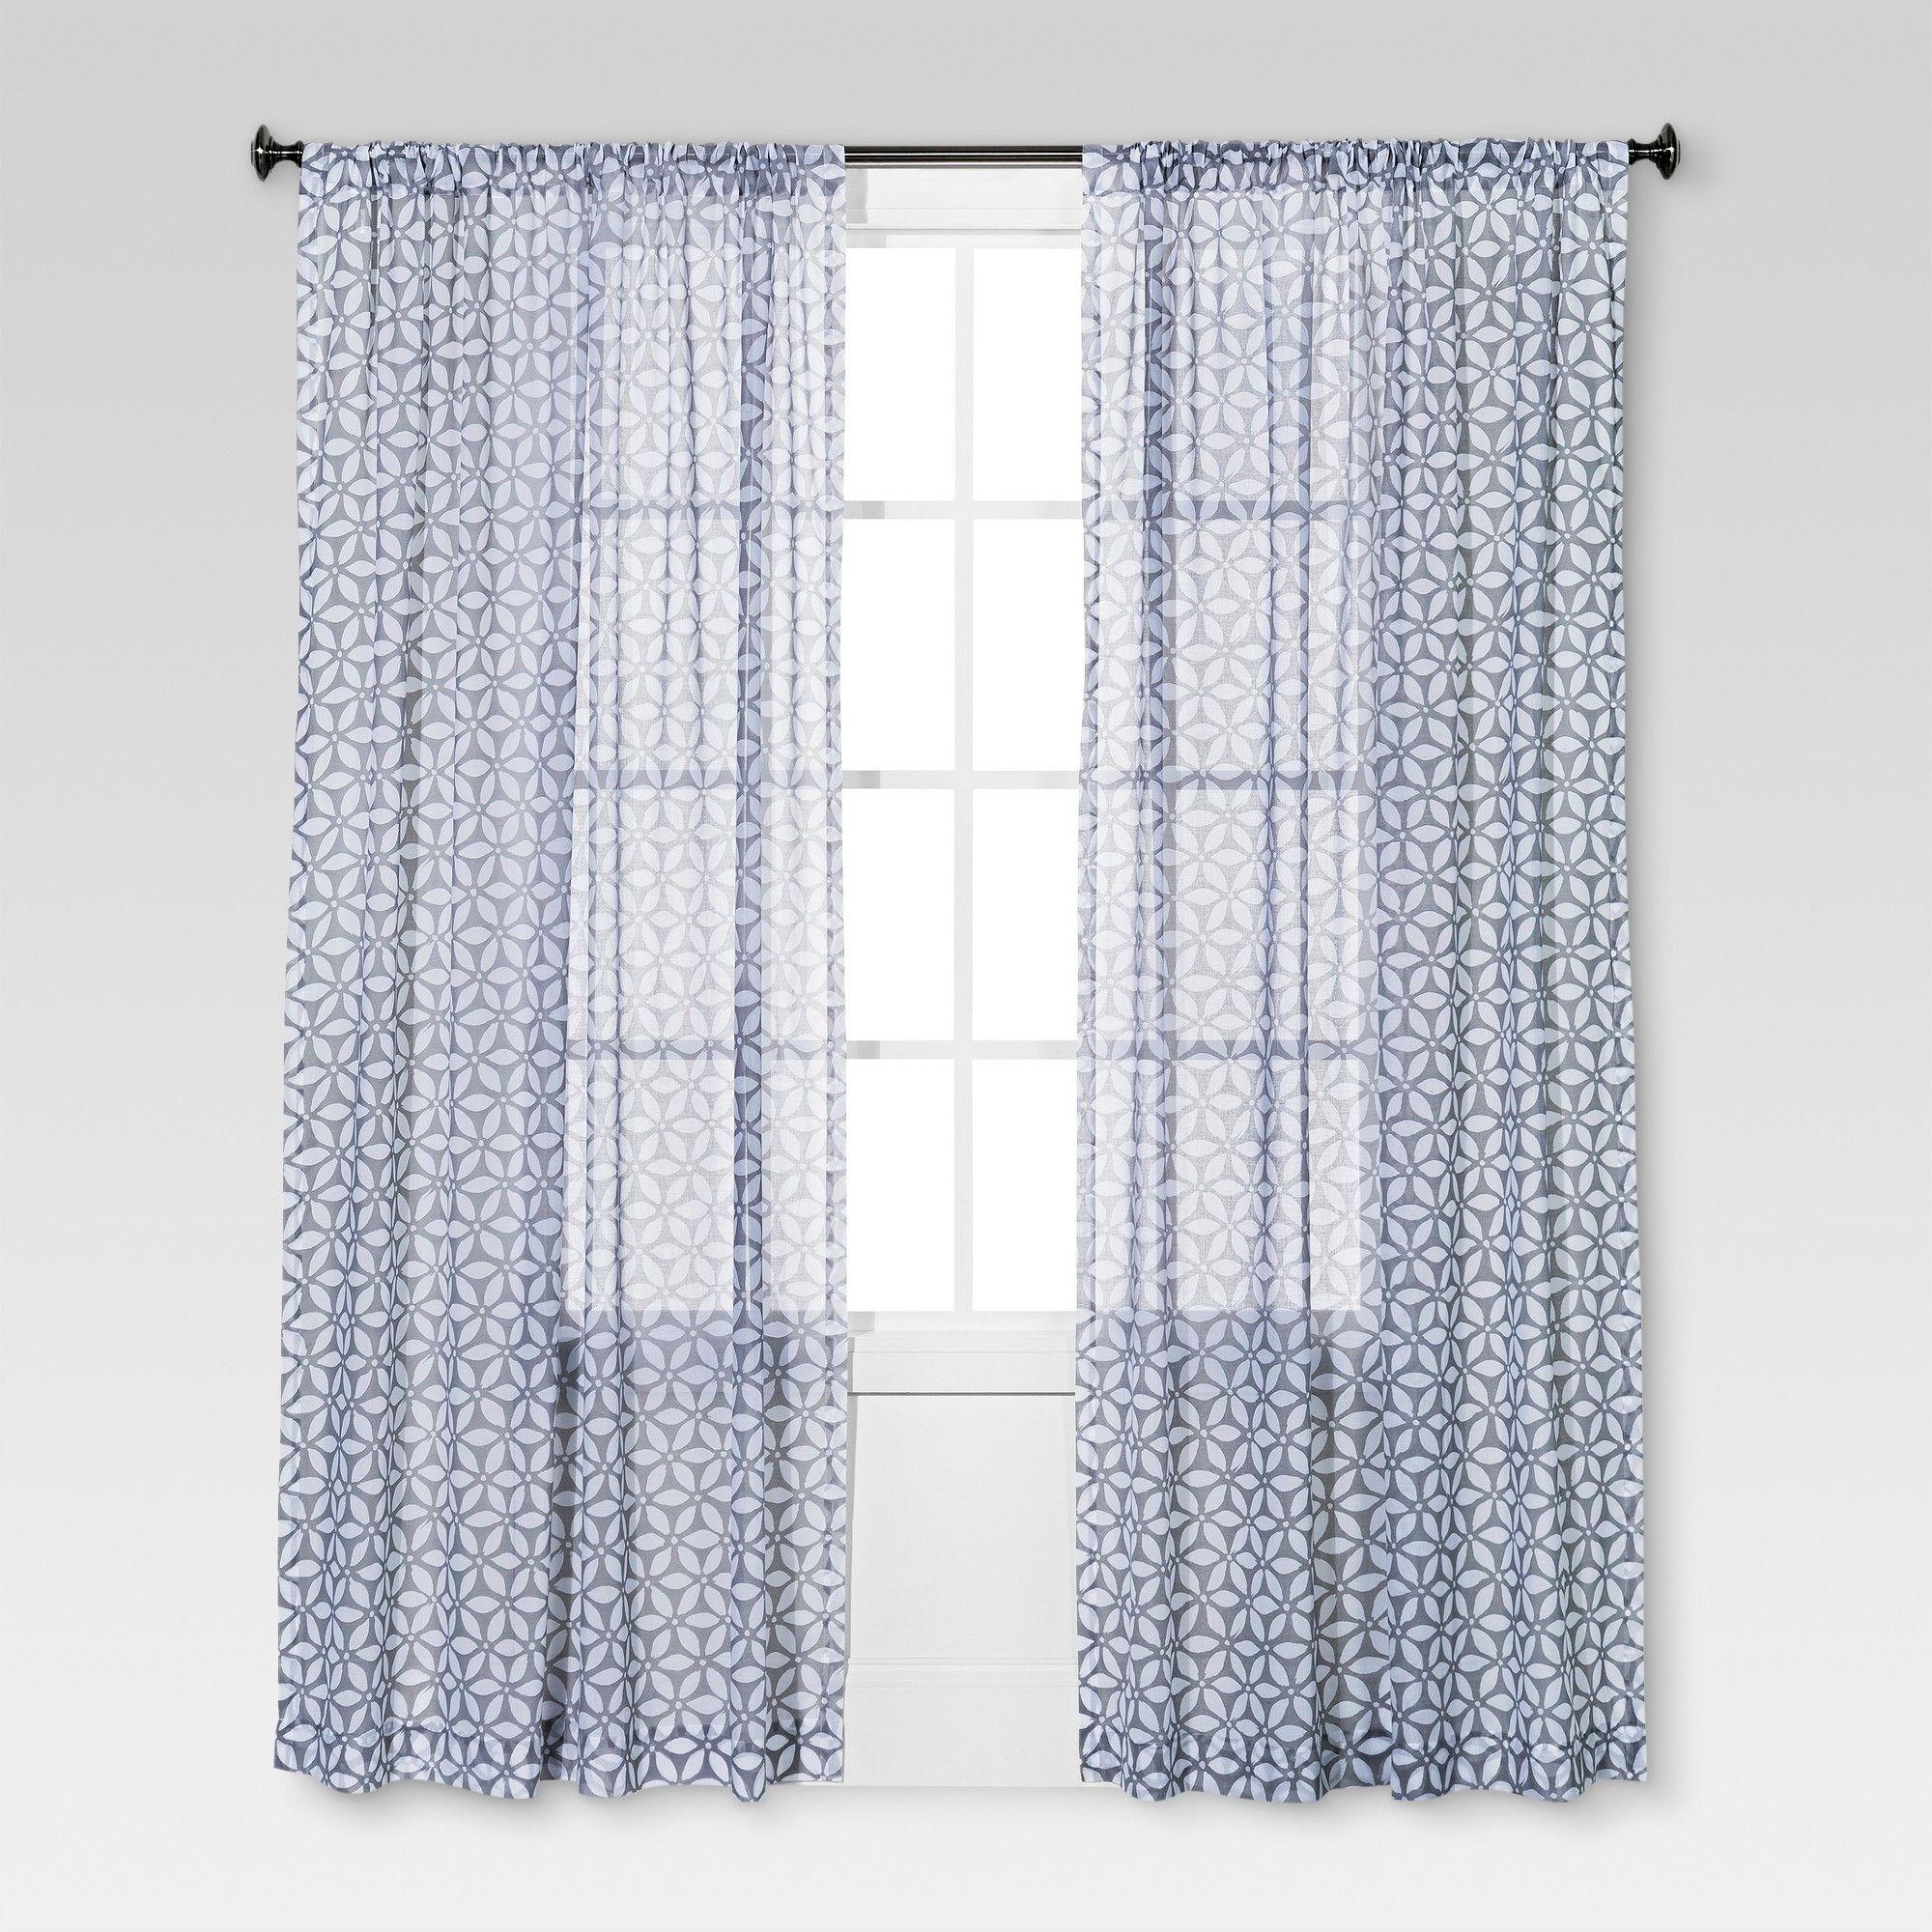 Sand Dollar Printed Sheer Curtain Panel Gray